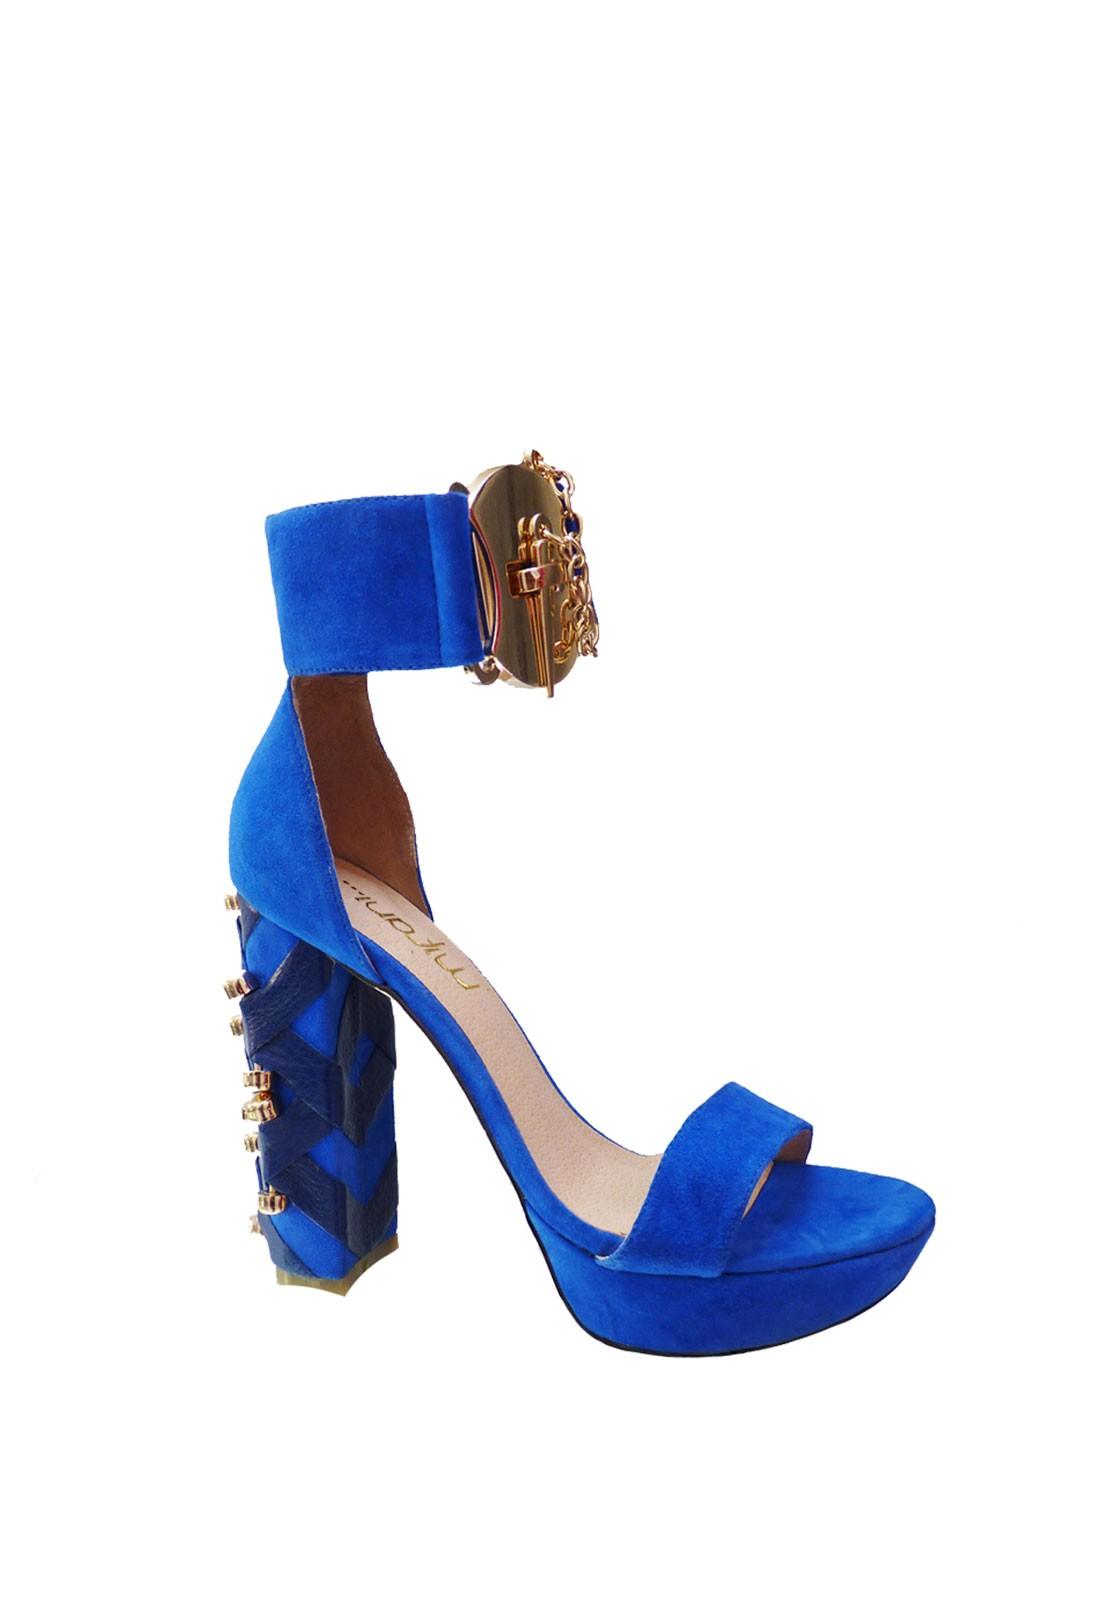 mifani-st-tropez-suede-shoe-in-cobalt-blue-fr